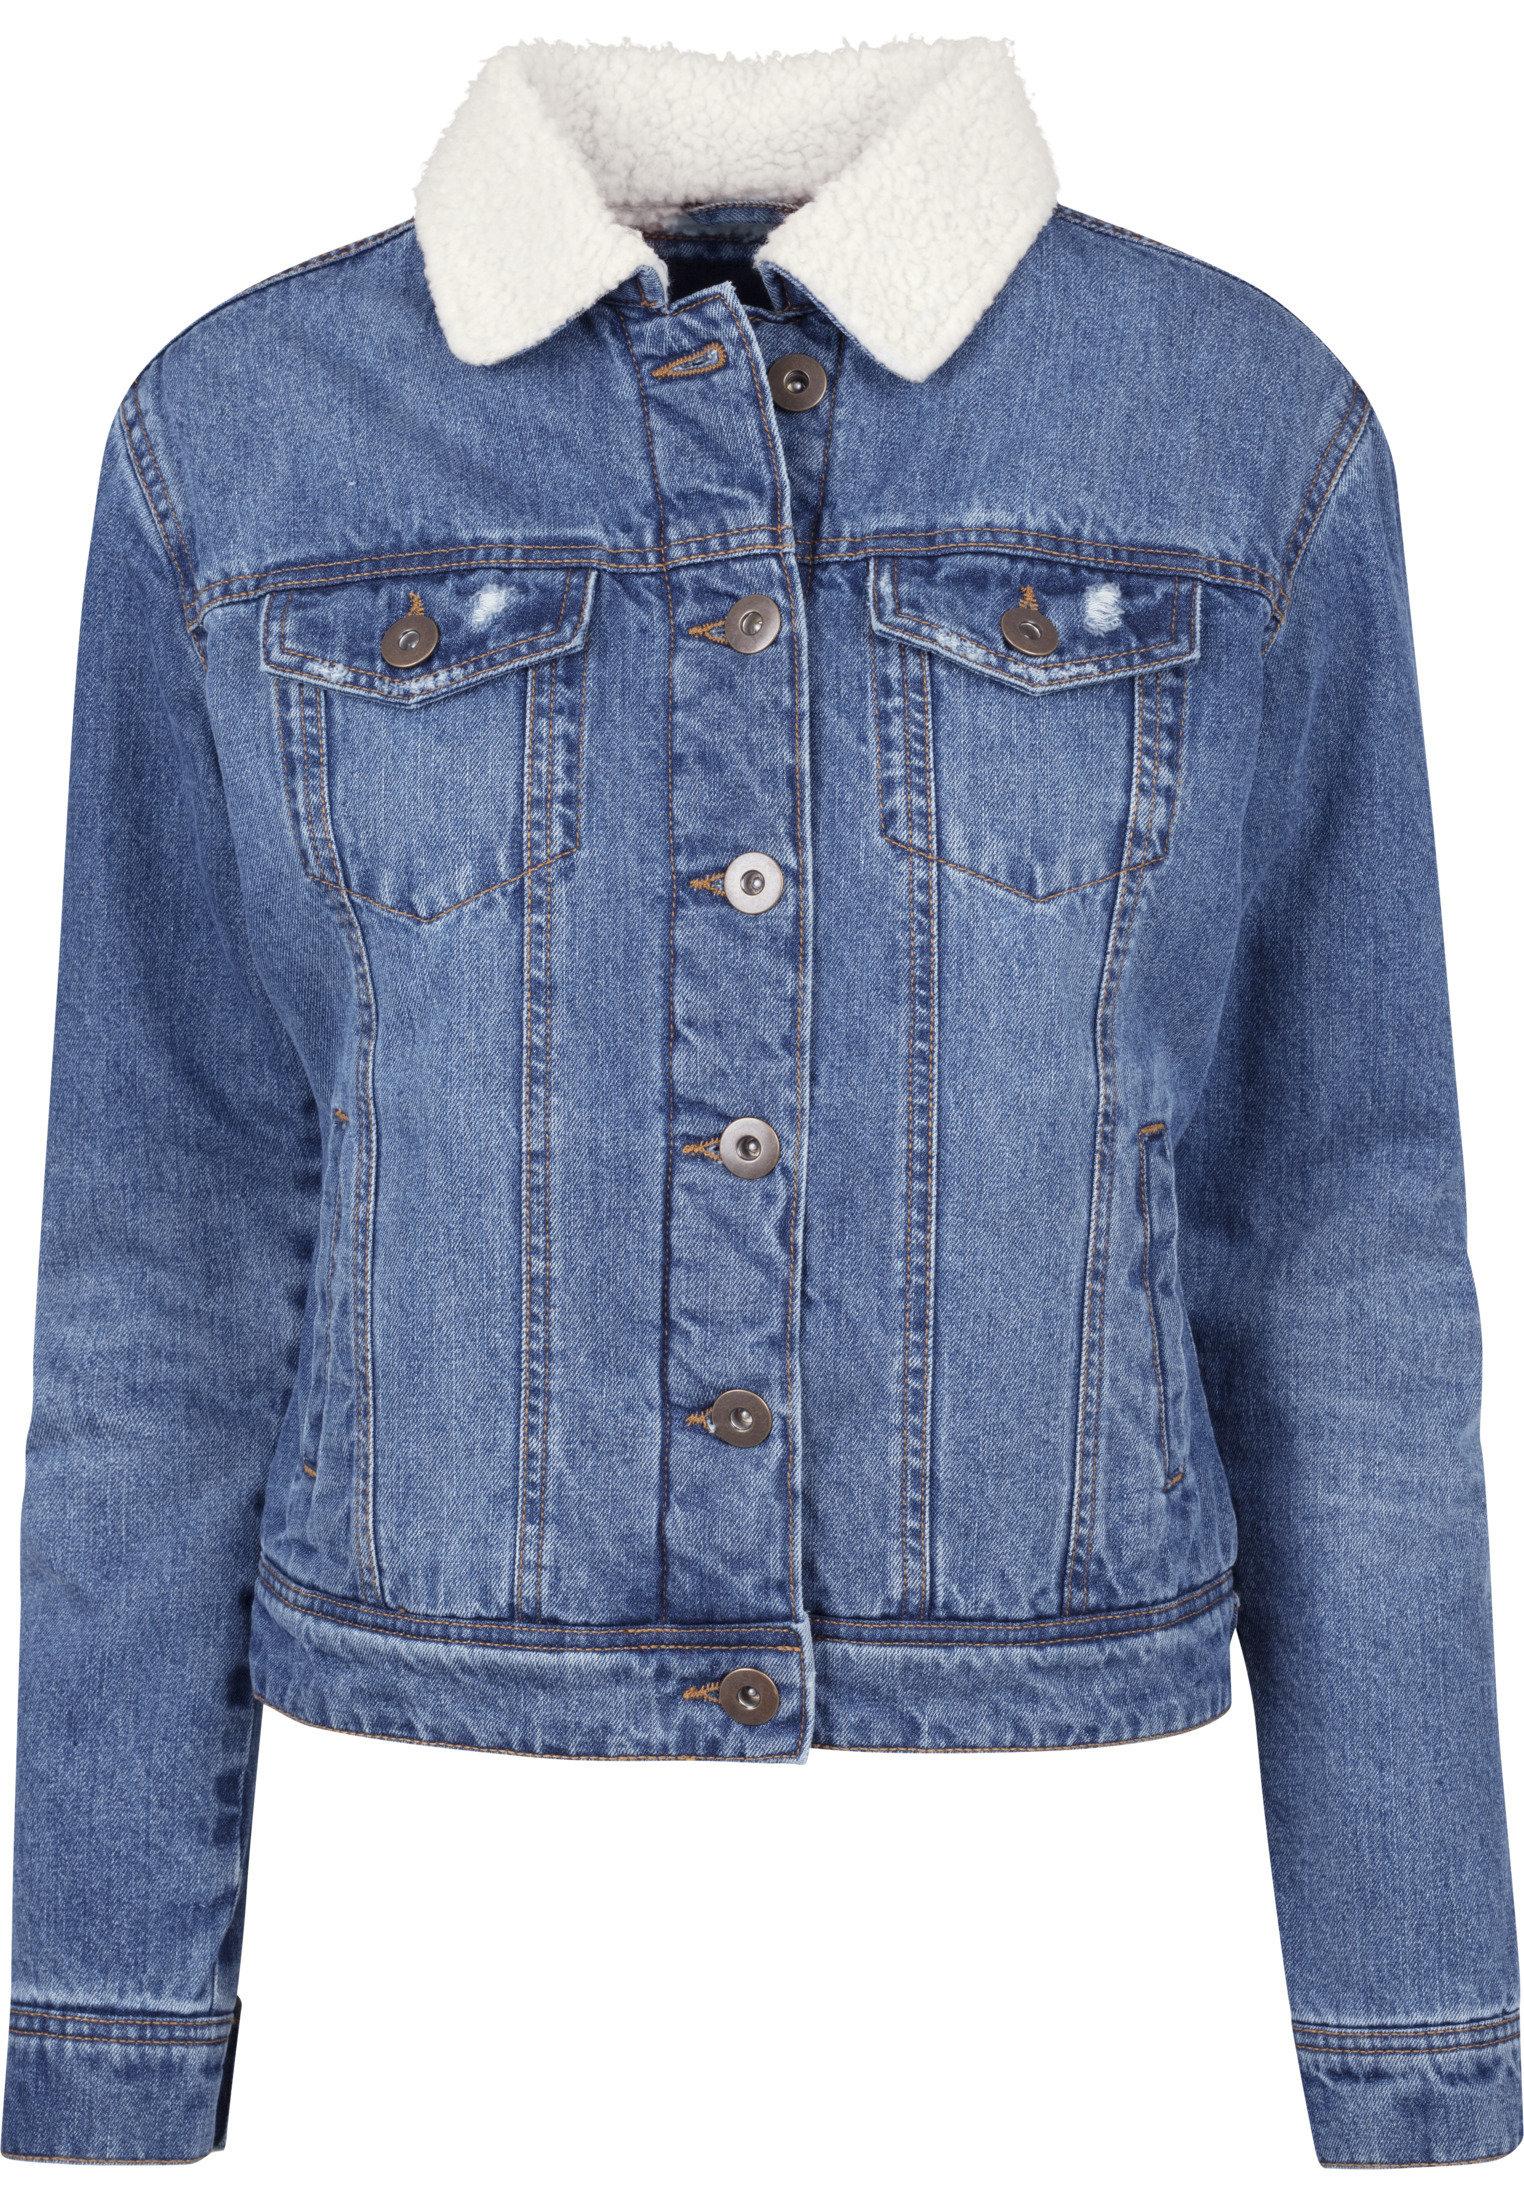 Veste en jean sherpa femme URBAN CLASSICS bleu washed urban classics-sherpa jean femme blue washed